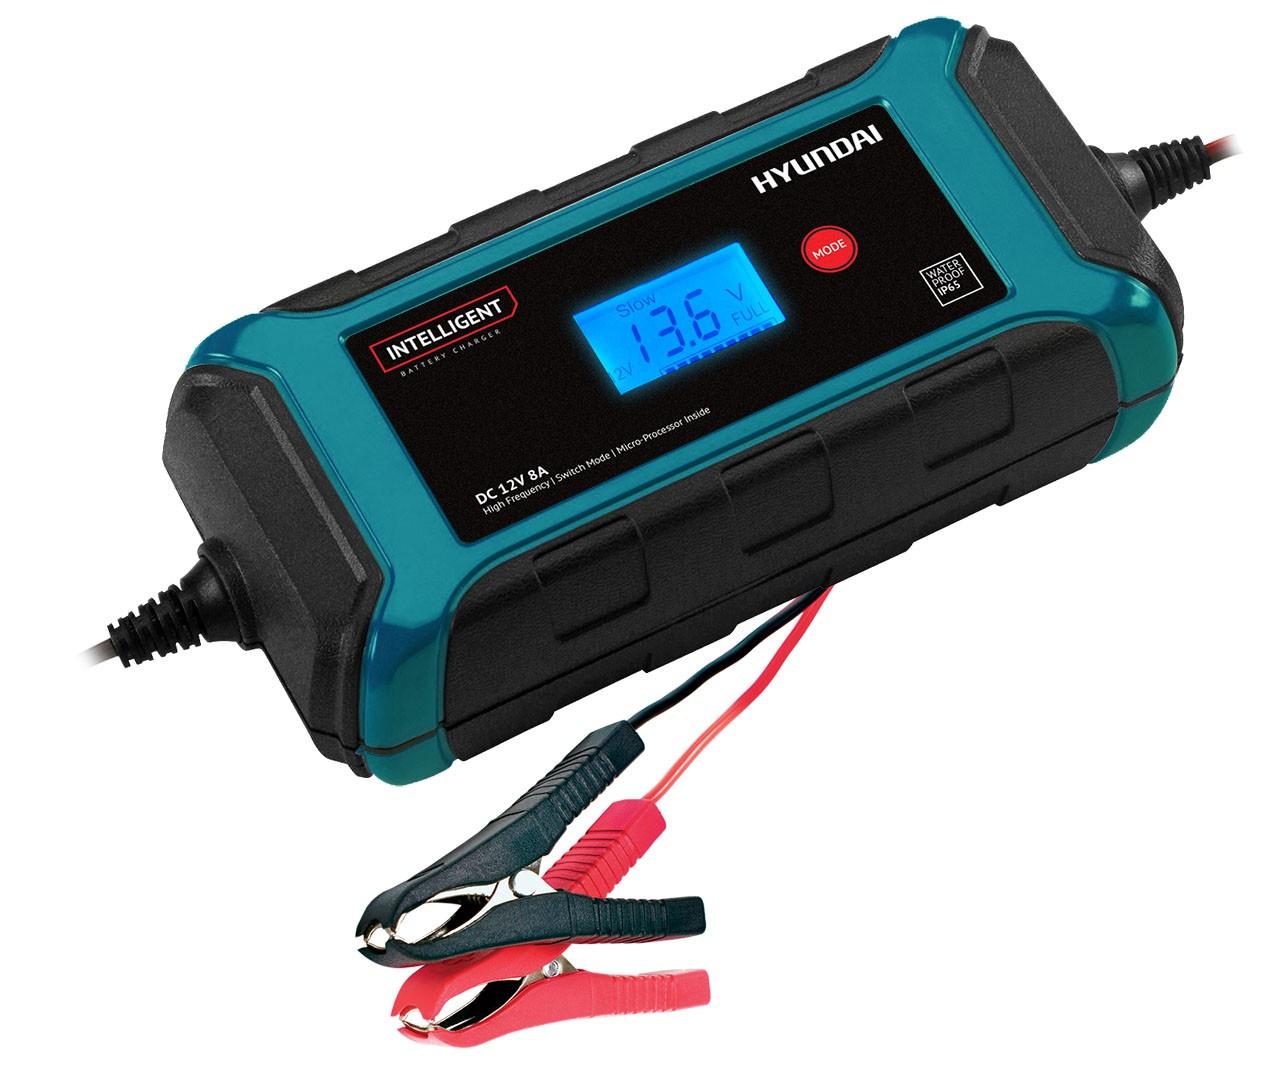 Зарядное устройство Hyundai HY 800 для АКБ автомобилей, черный зарядное устройство кулон 715d